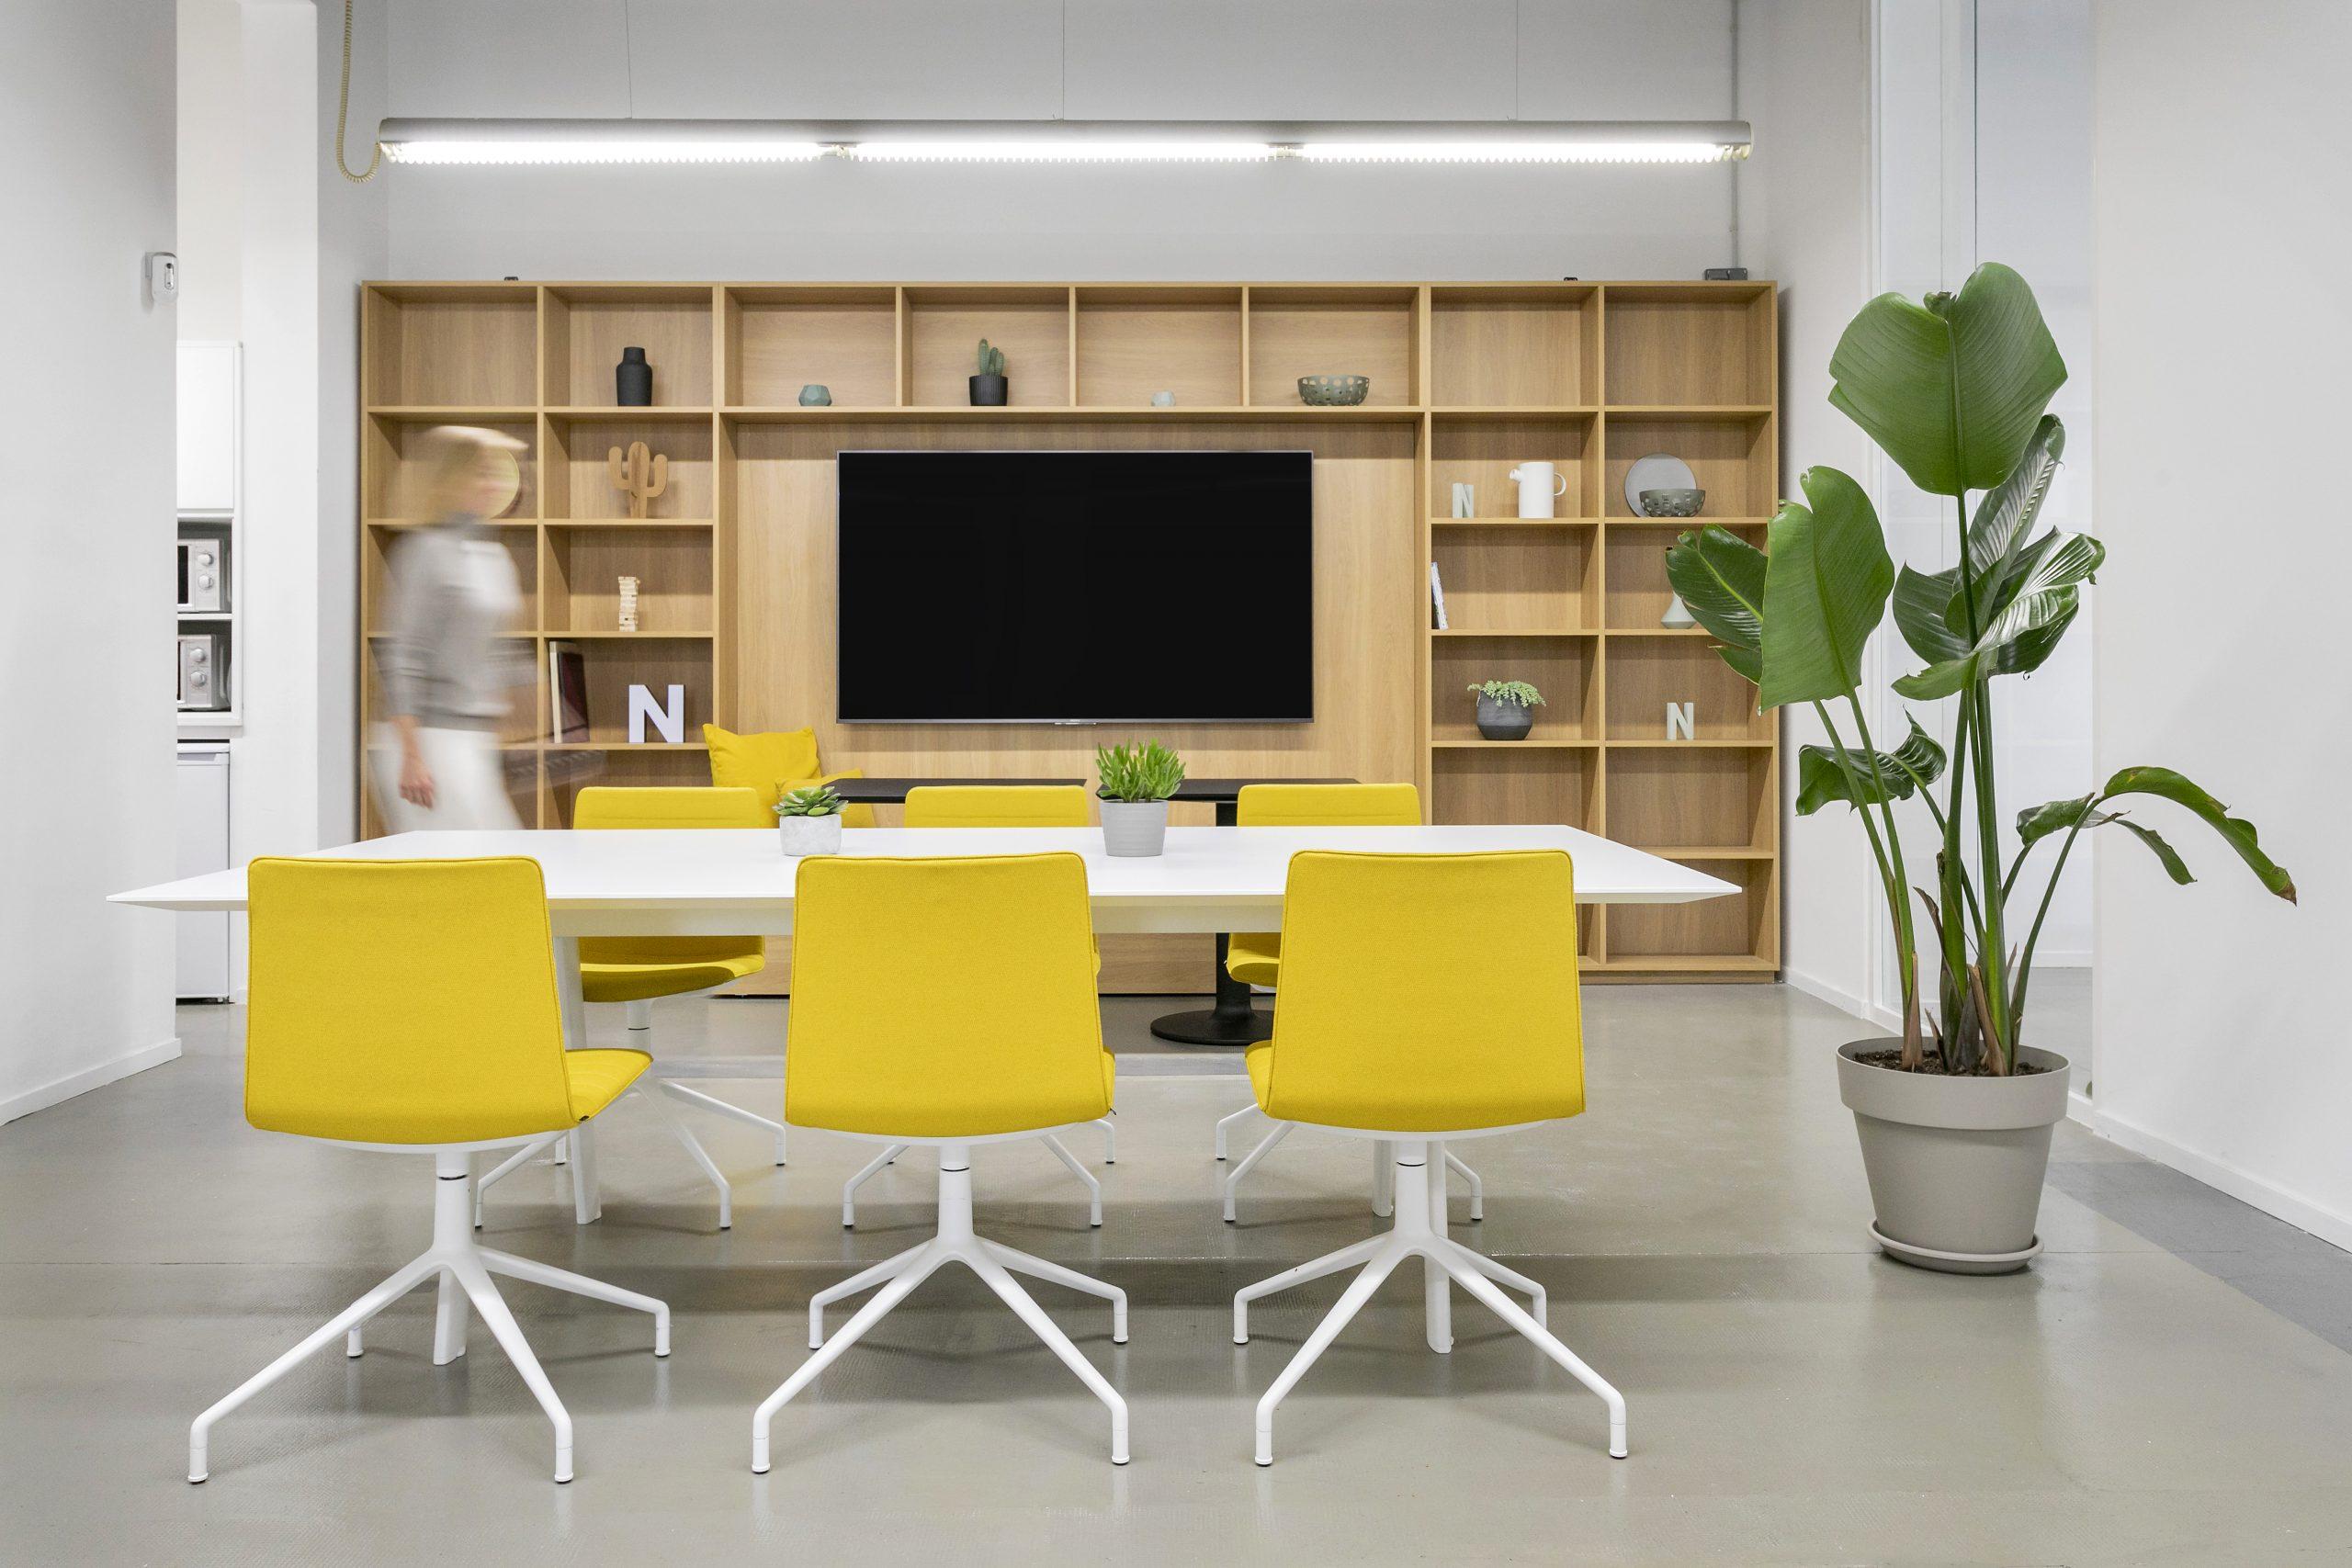 Neoland Oficinas Interiorismo Diseño